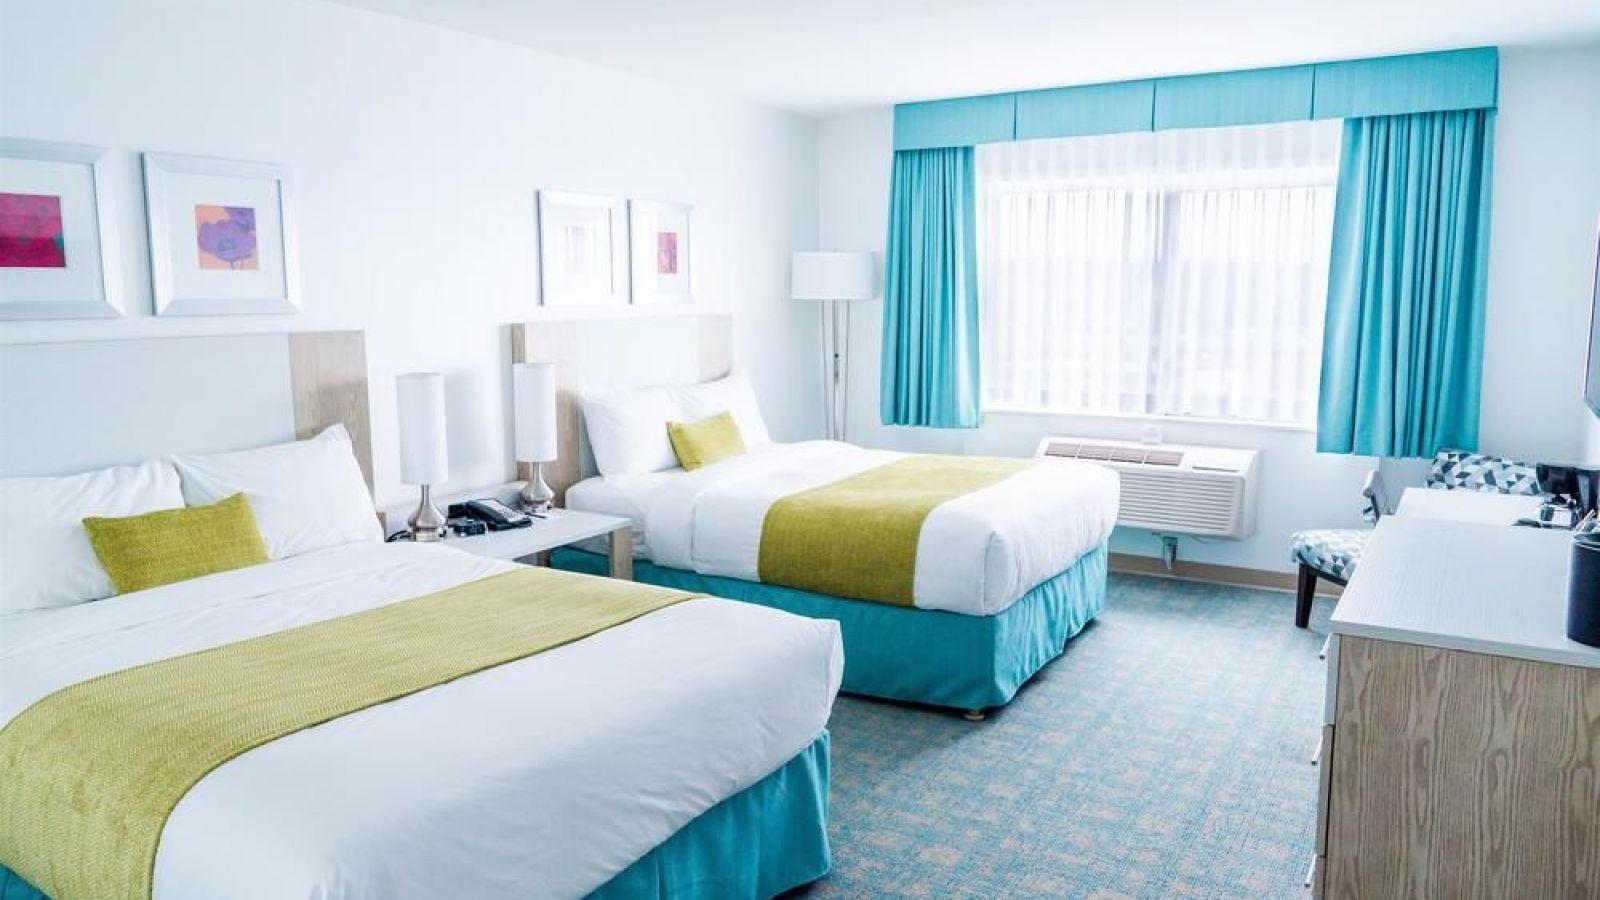 Coast Hotel & Convention Centre Langley - 2 queen room